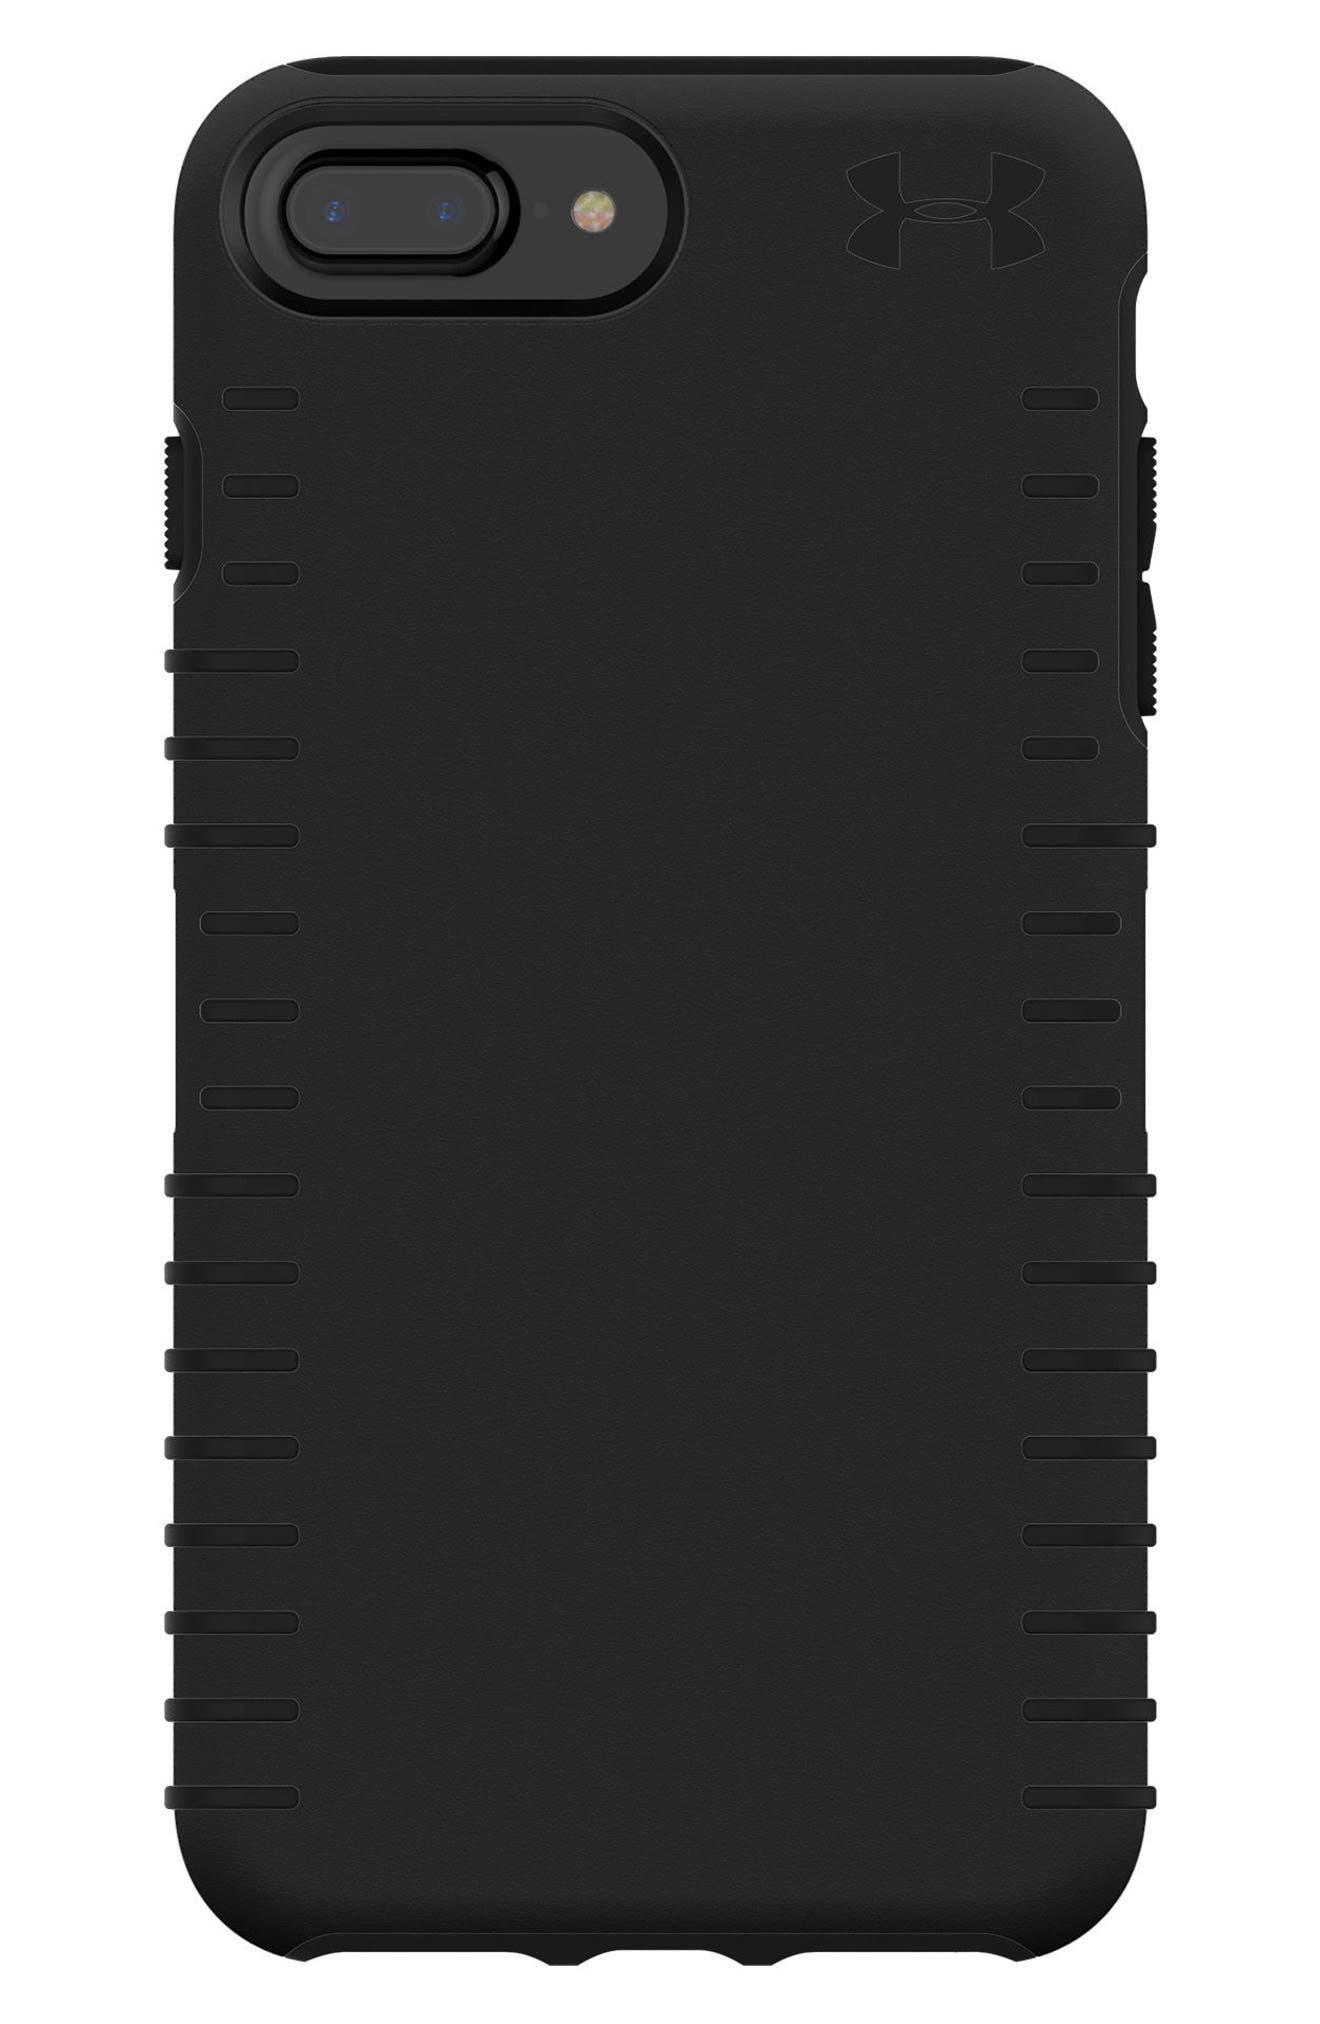 Protect Grip iPhone 6/6s/7/8 Plus Case,                             Main thumbnail 1, color,                             001